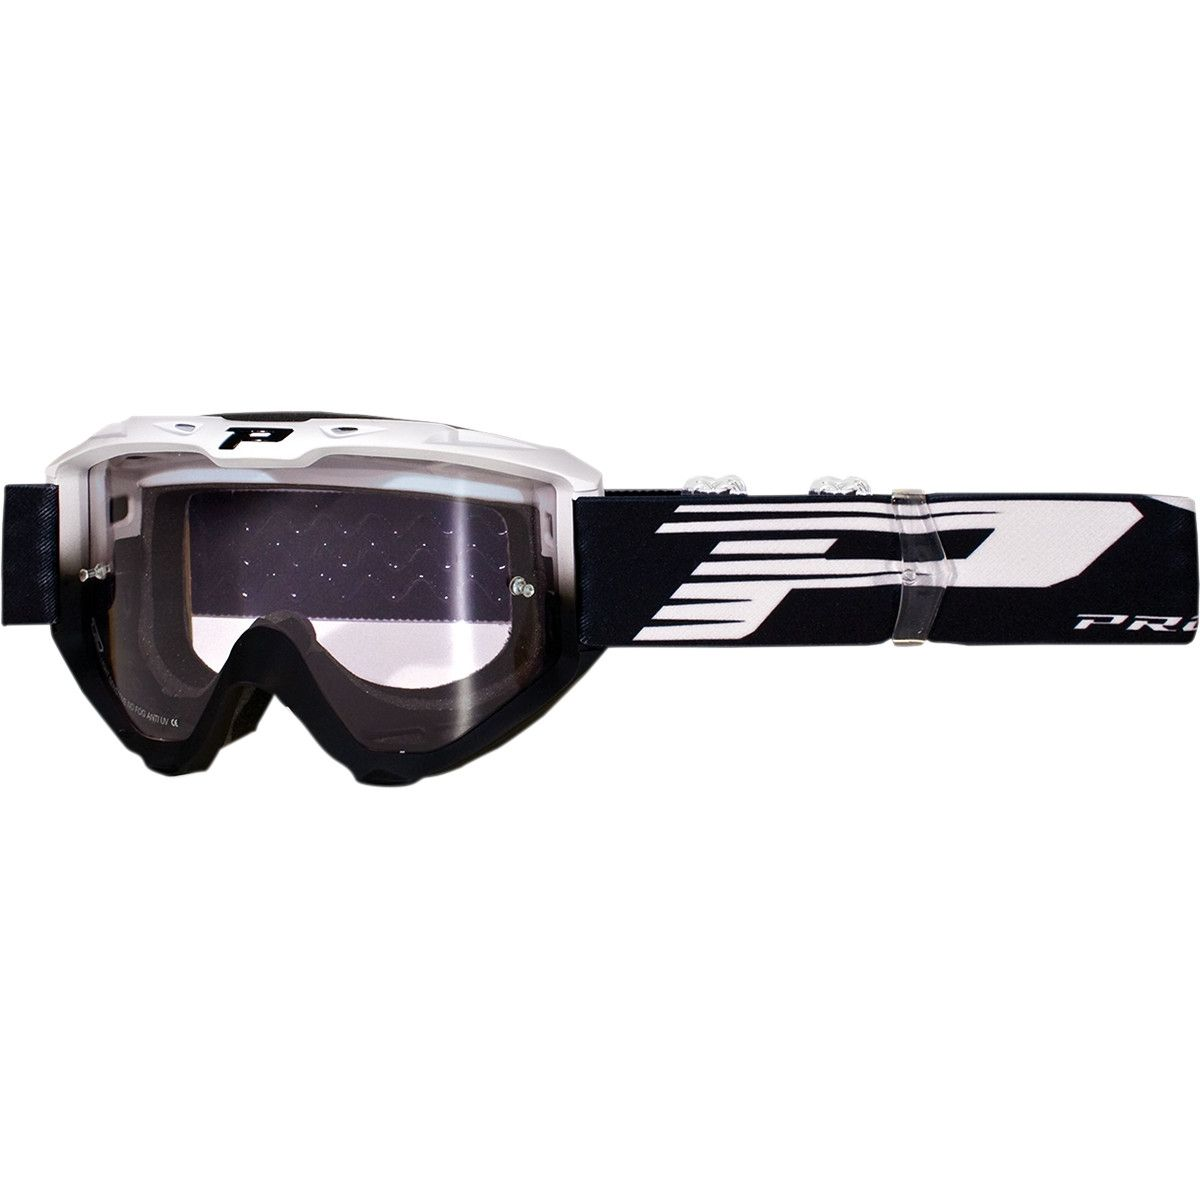 Progrip Crossbril 3450 Light Sensitive Riot Black/White